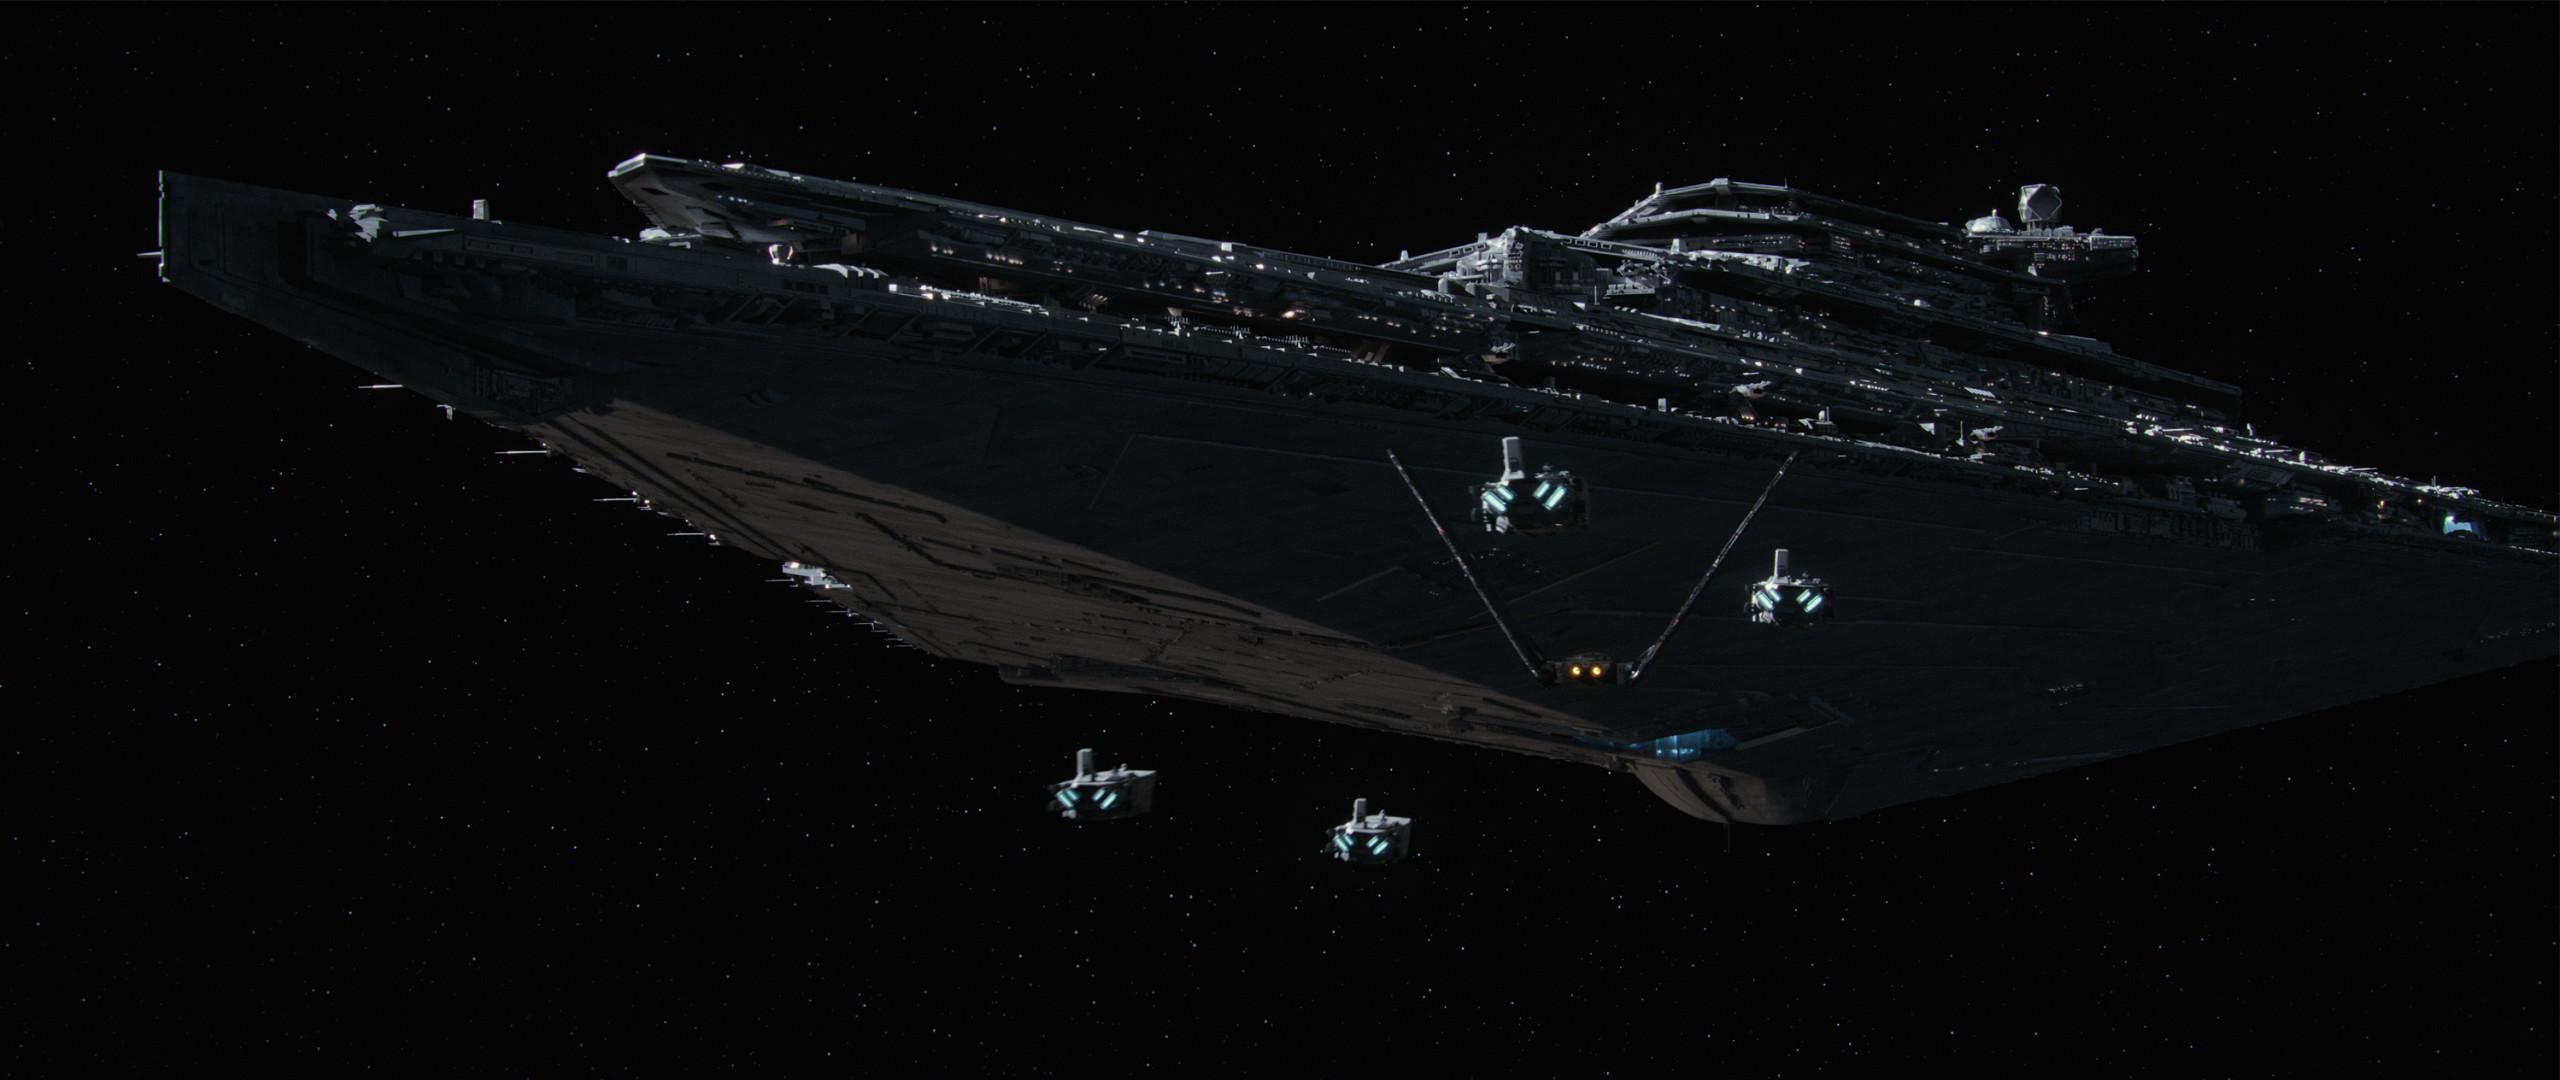 Star Wars, Star Destroyer, Science Fiction, Star Wars: Episode VII The Force